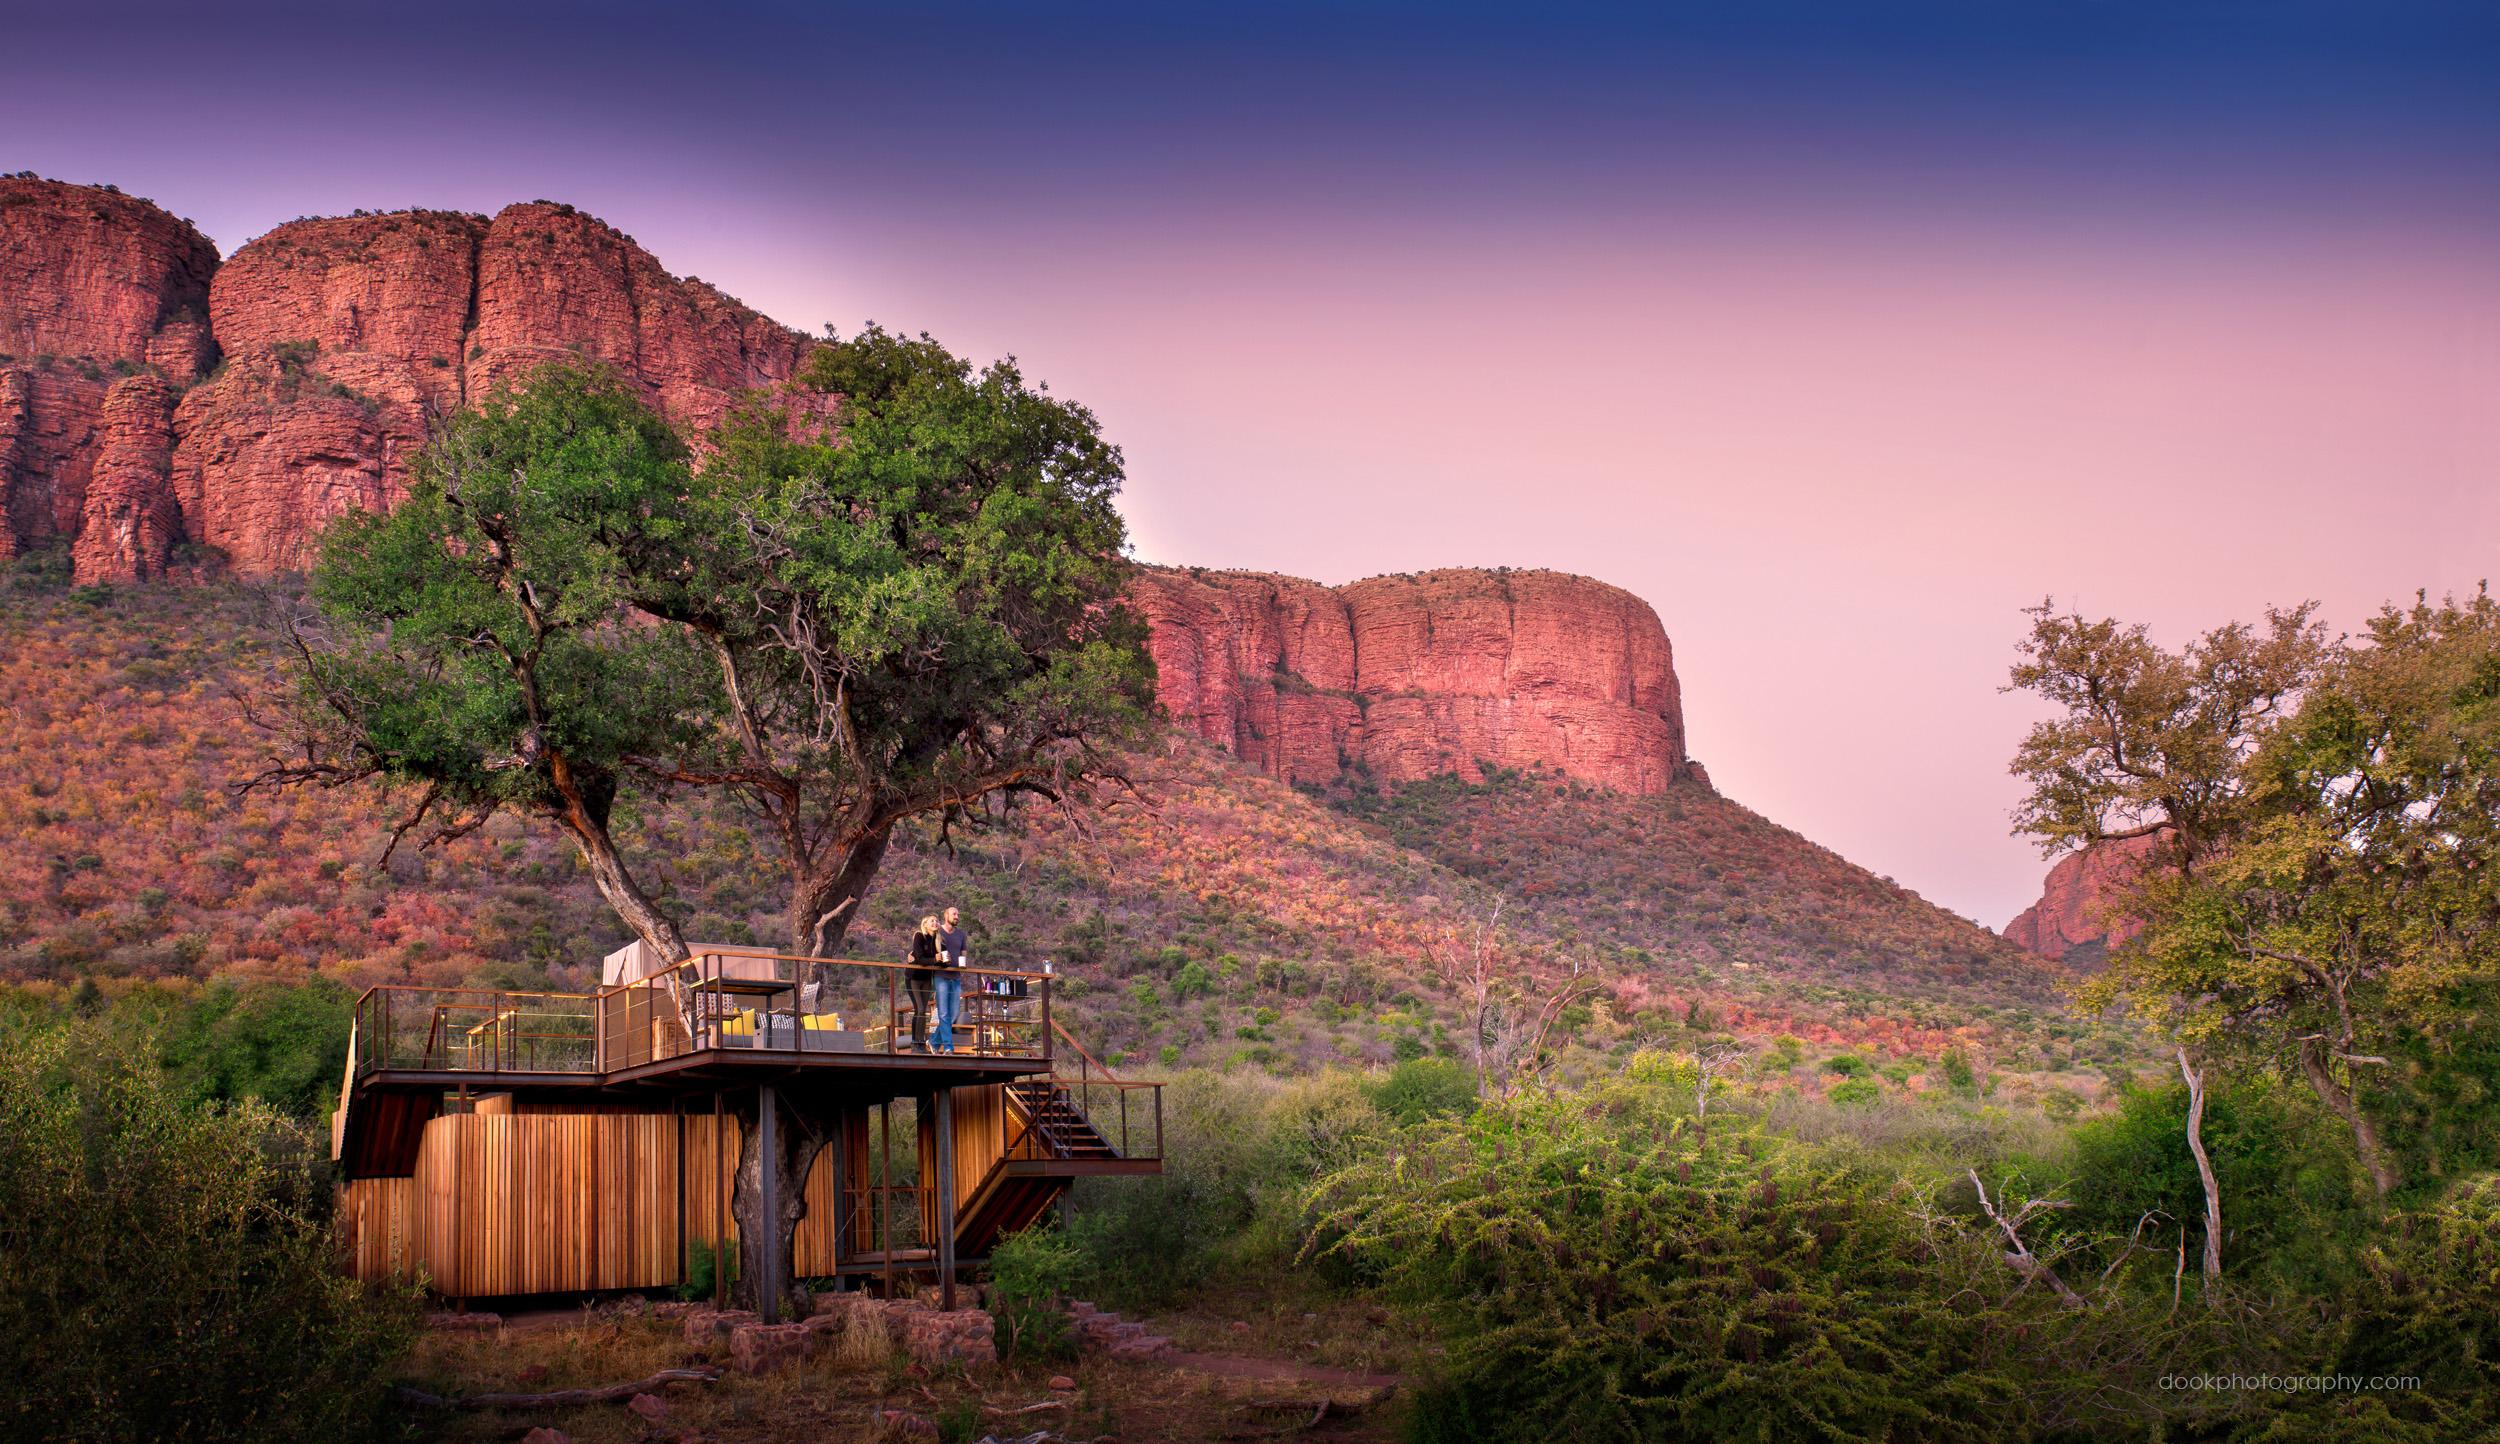 Thabametsi Tree House